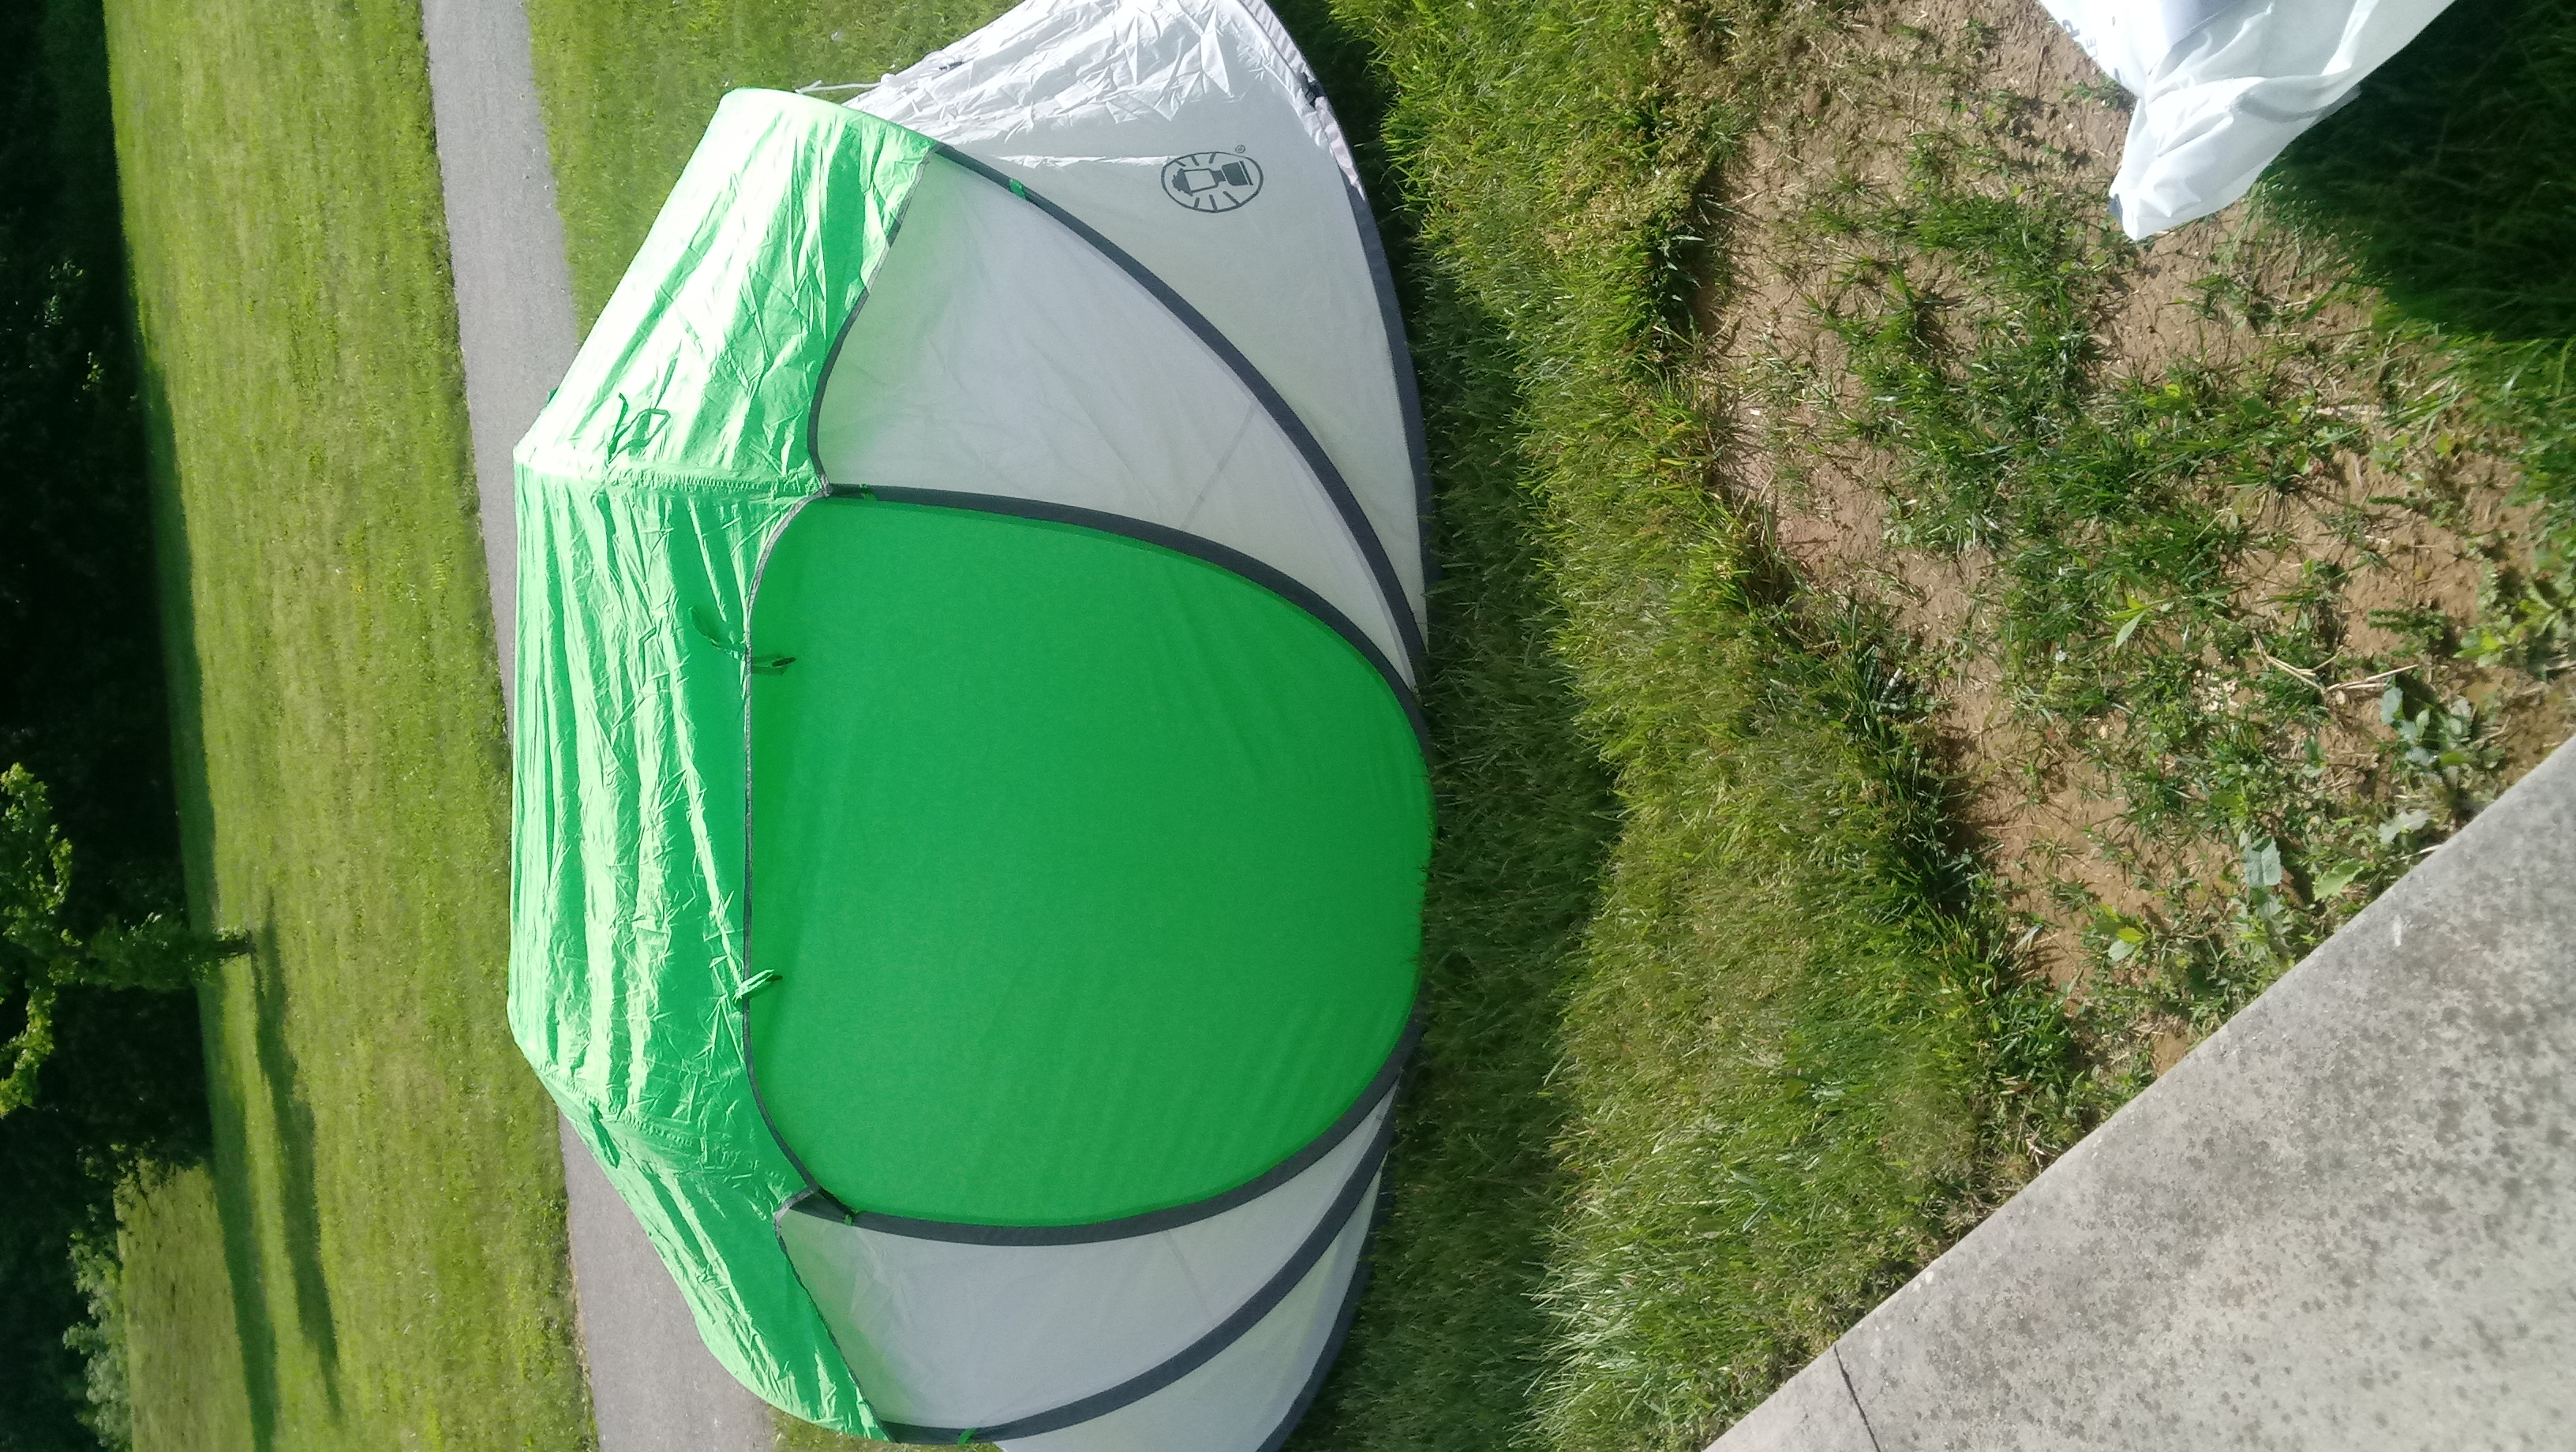 FileColeman Pop-Up Tent.jpg & File:Coleman Pop-Up Tent.jpg - Wikimedia Commons